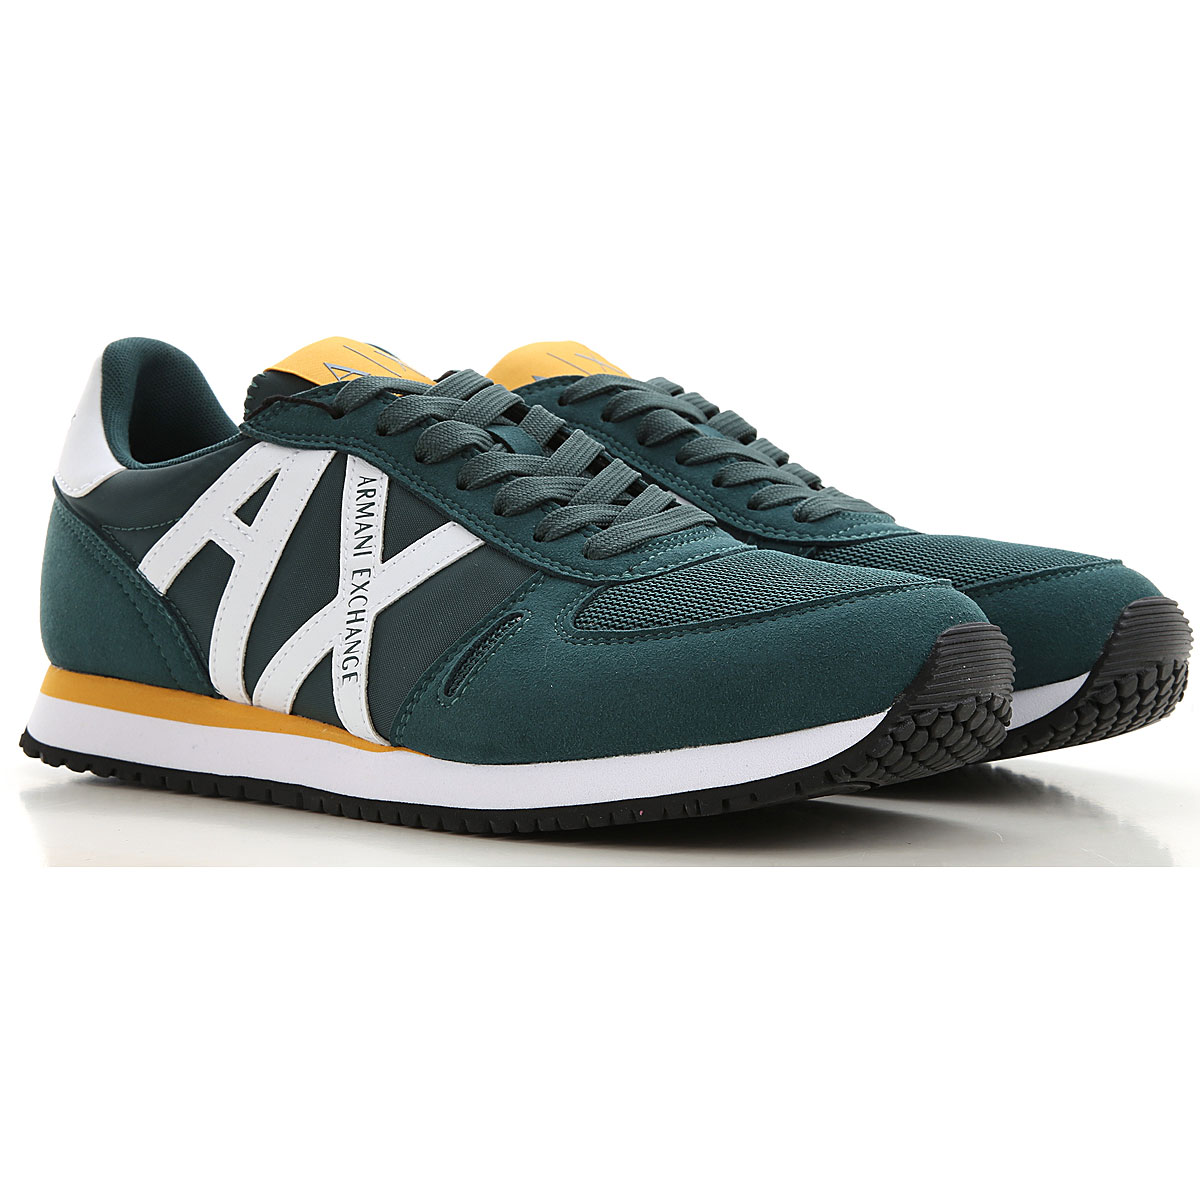 Armani Exchange Sneakers for Men On Sale, Green, polyester, 2019, UK 10 - EUR 44 - US 11 UK 5 - EUR 39 - US 6